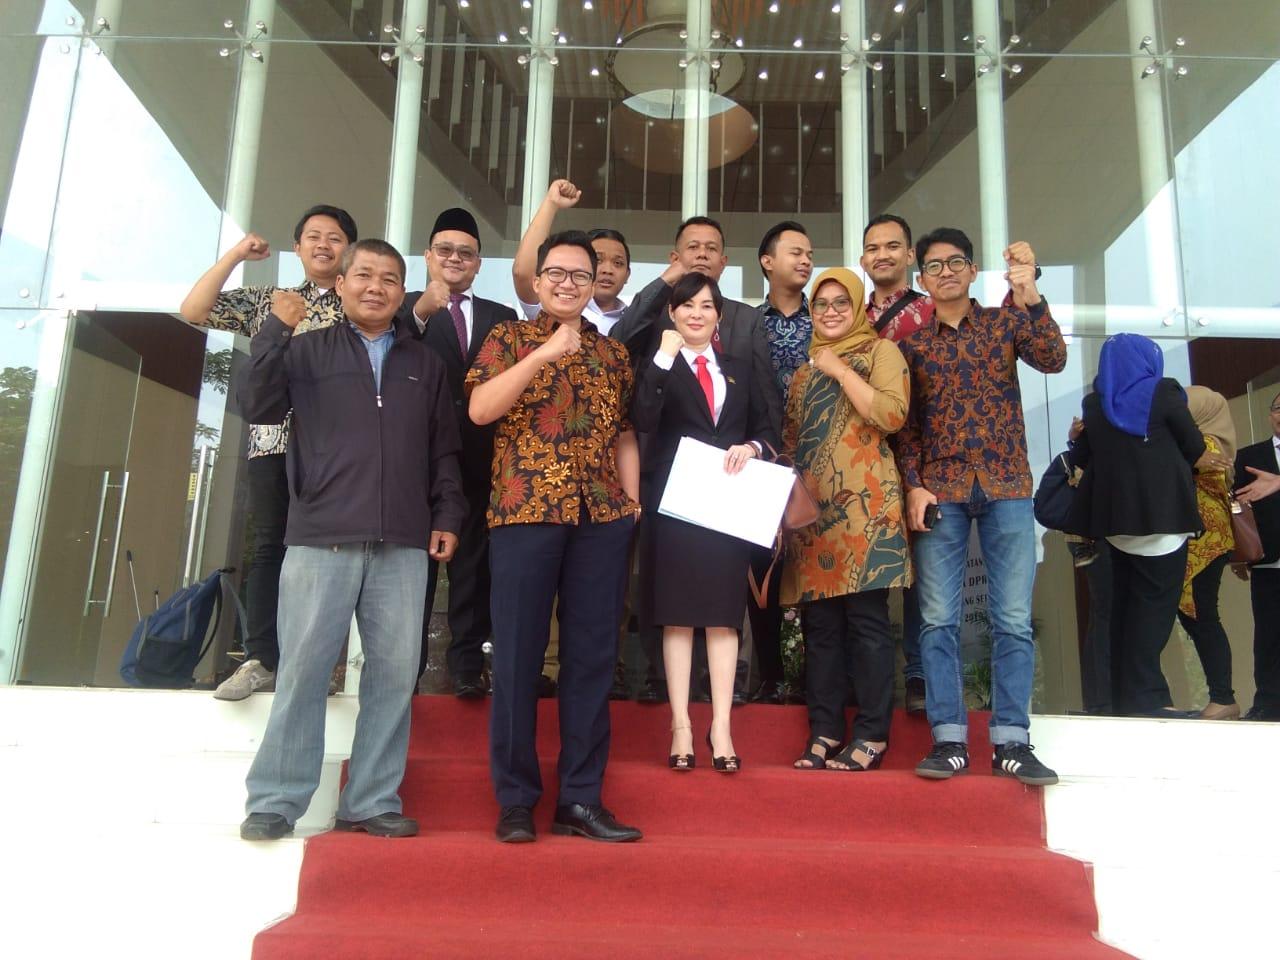 Li Claudia Chandra Resmi Dilantik Pengangkatannya Anggota DPRD Tahun 2019-2024 Kota Tangerang Selatan